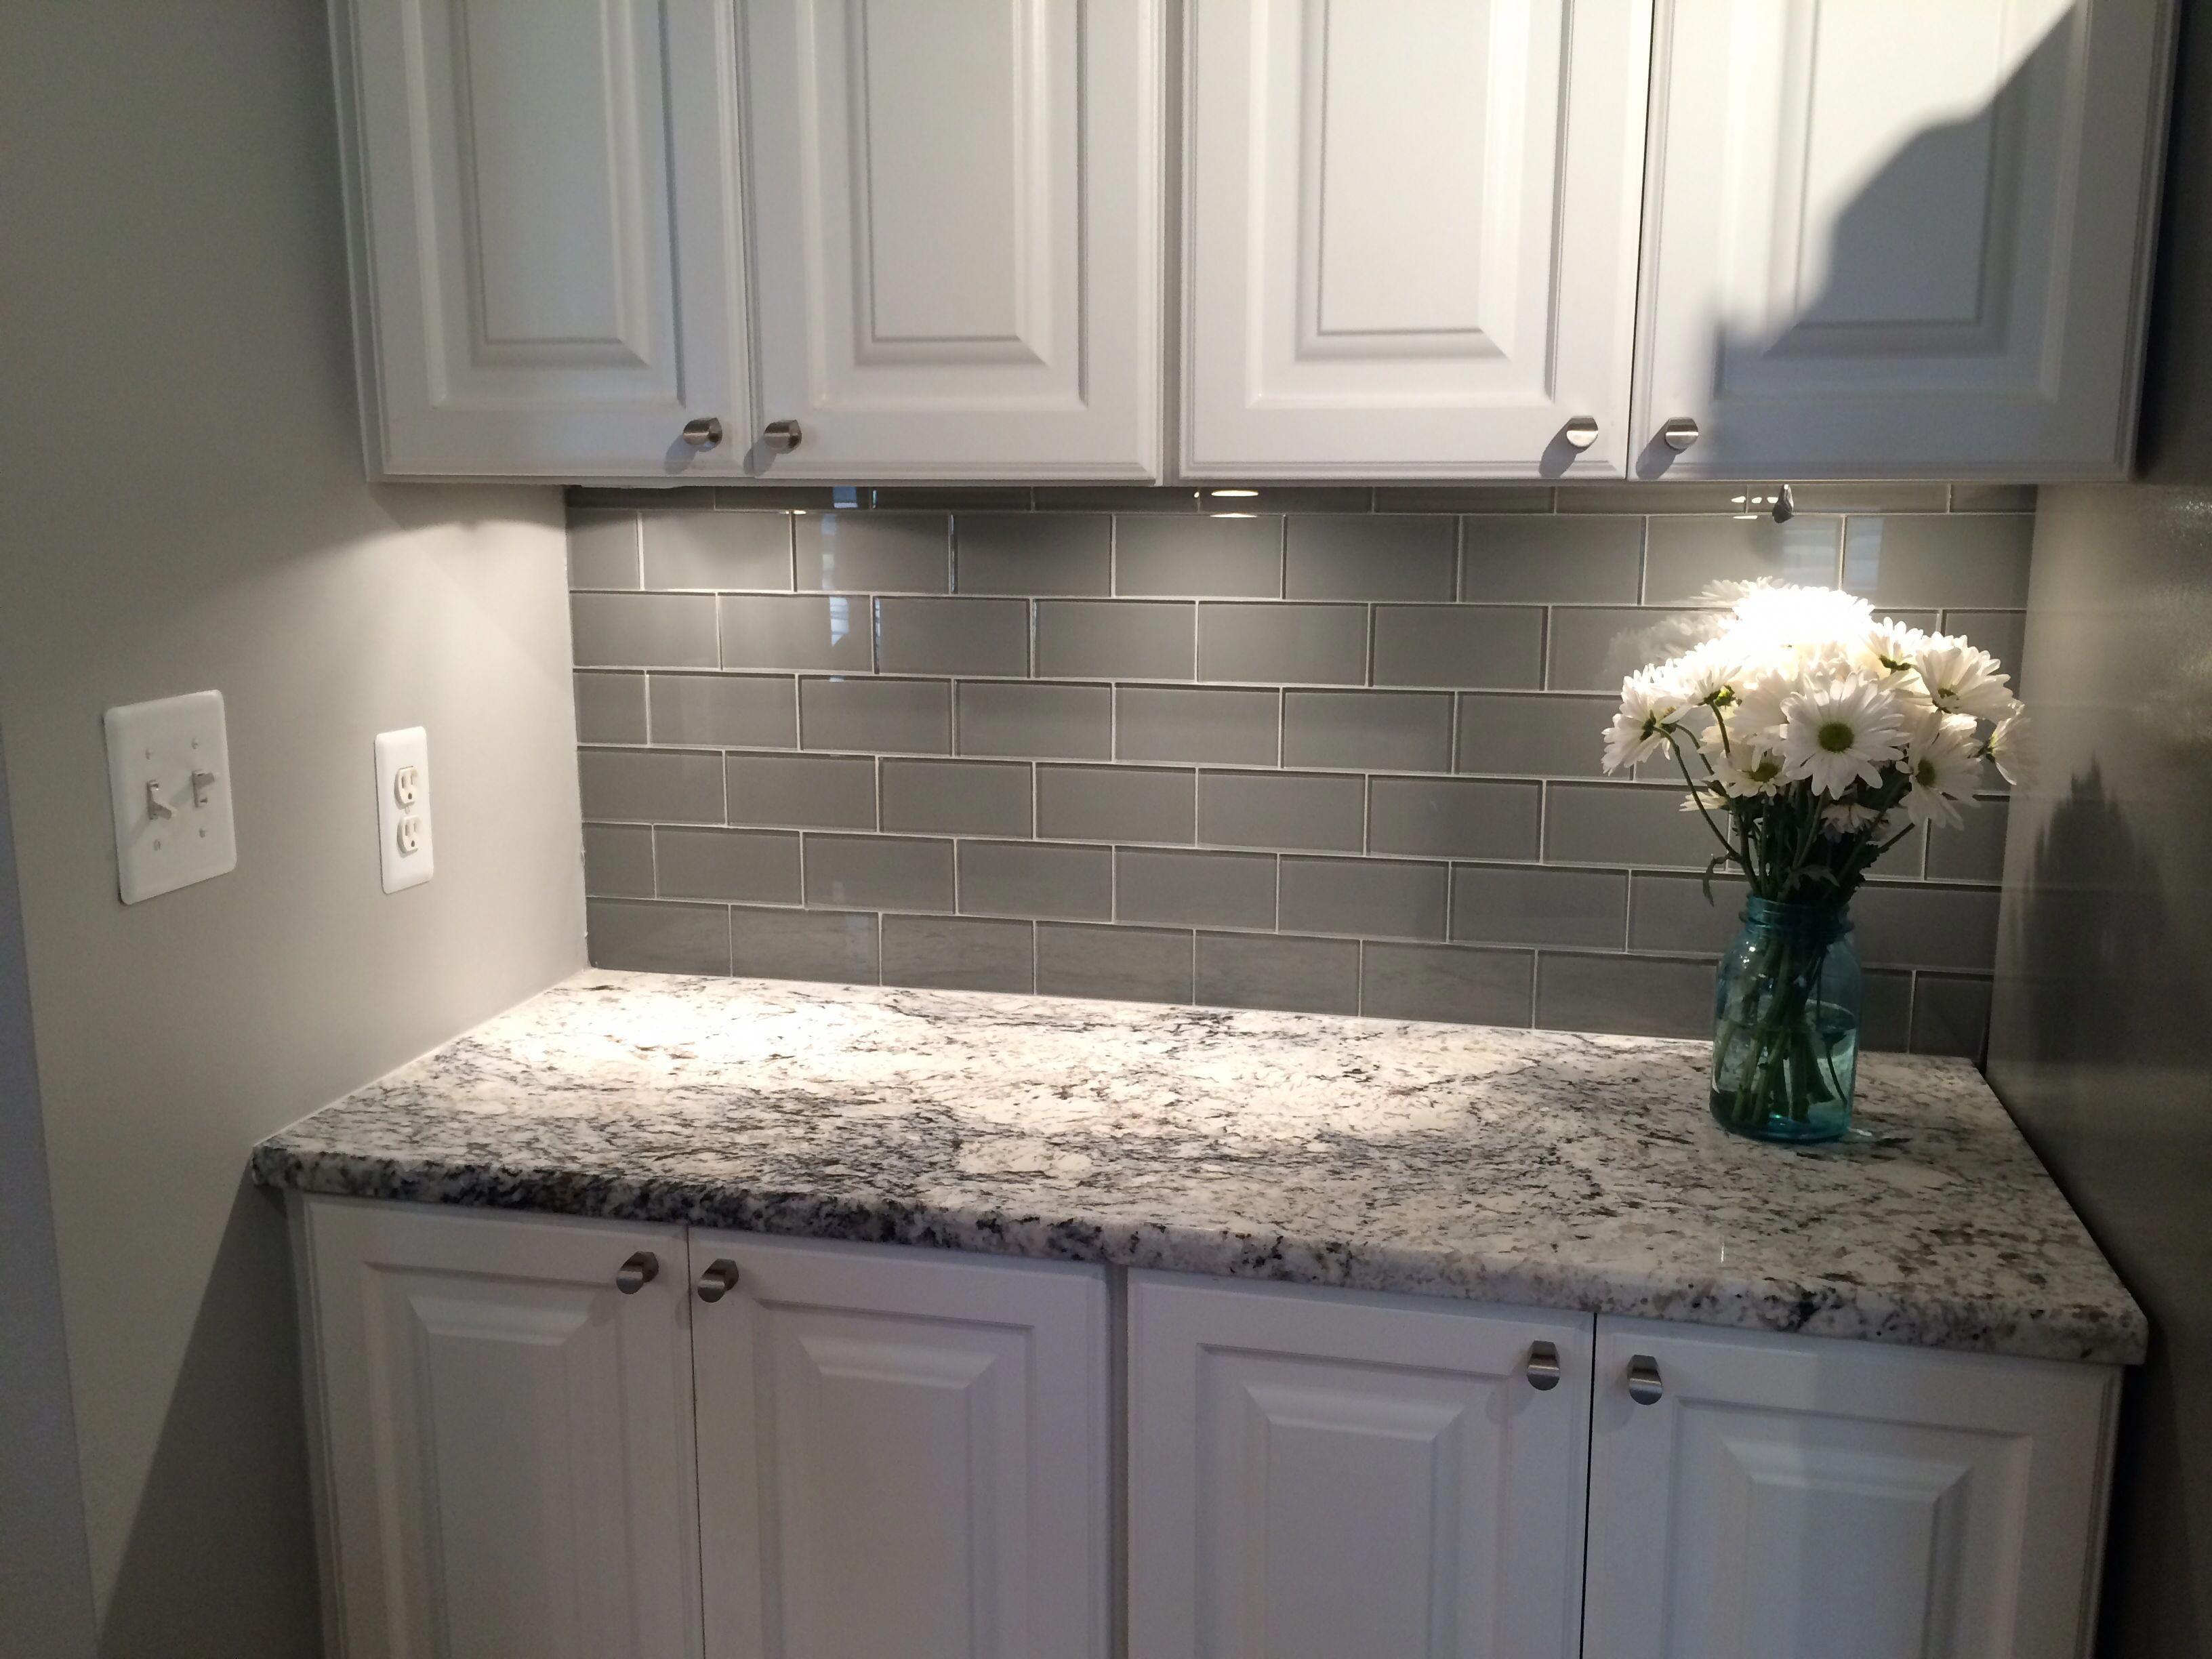 Modern Kitchen Design With Azul Platino Granite Countertop White Paint Kitchen C Unique Kitchen Tile Trendy Kitchen Backsplash Unique Kitchen Tiles Backsplash